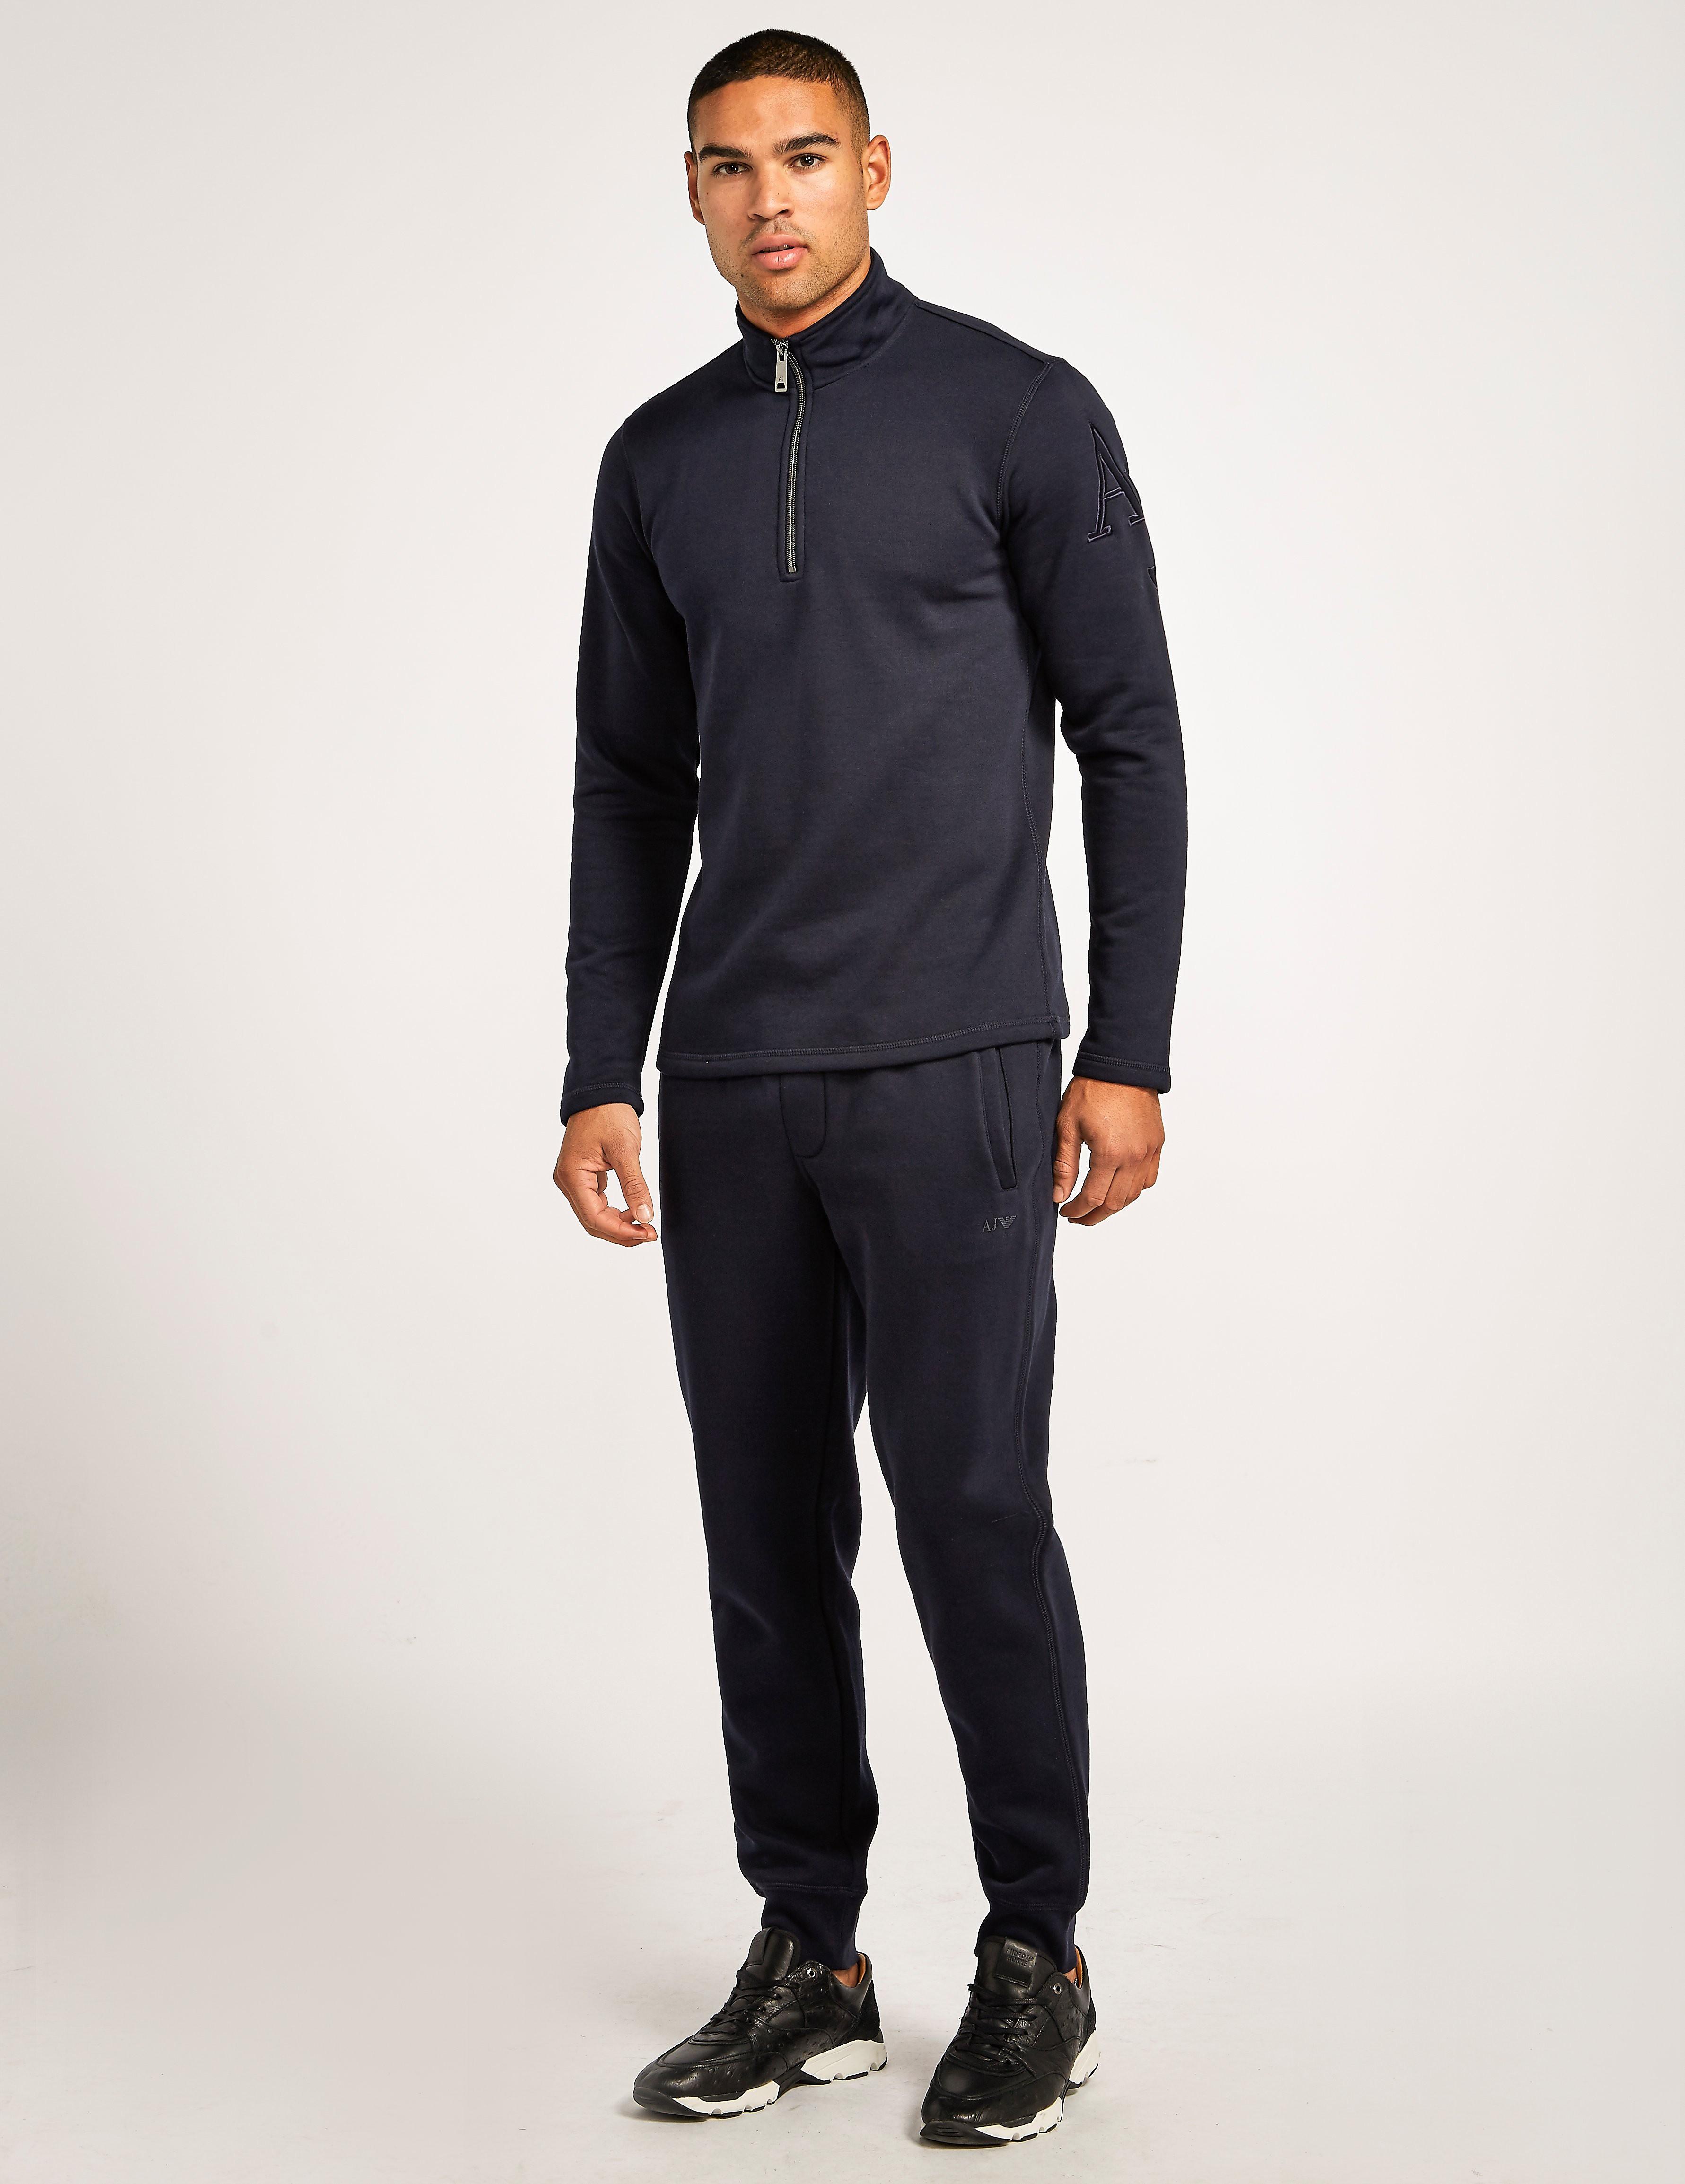 Armani Jeans Cotton 1/4 Zip Knit